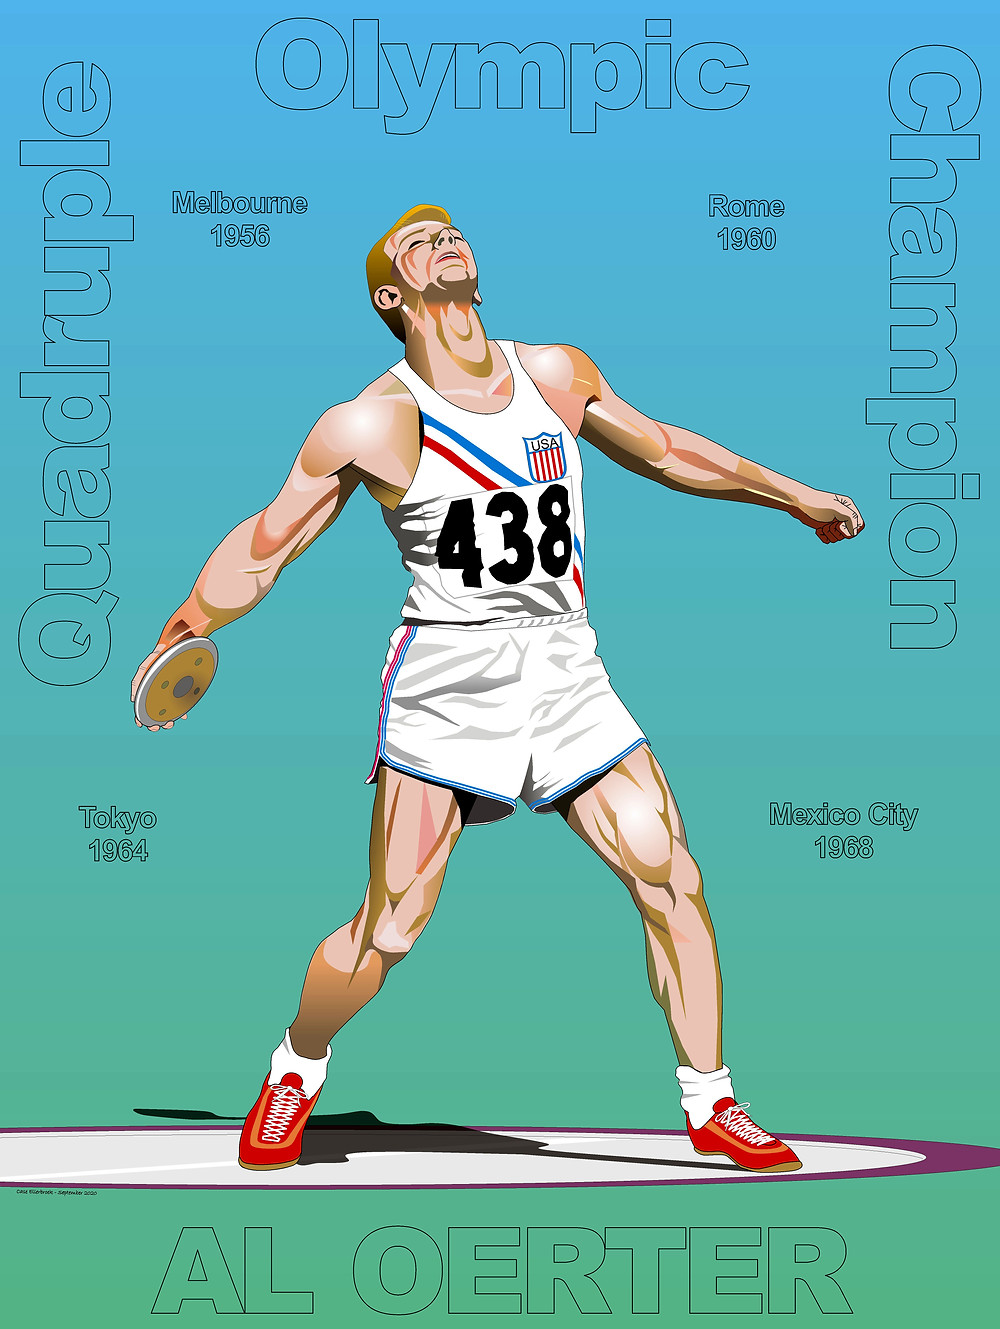 Colour illustration of Al Oerter, Olympic Discus Thrower, 1956 by Case Ellerbroek